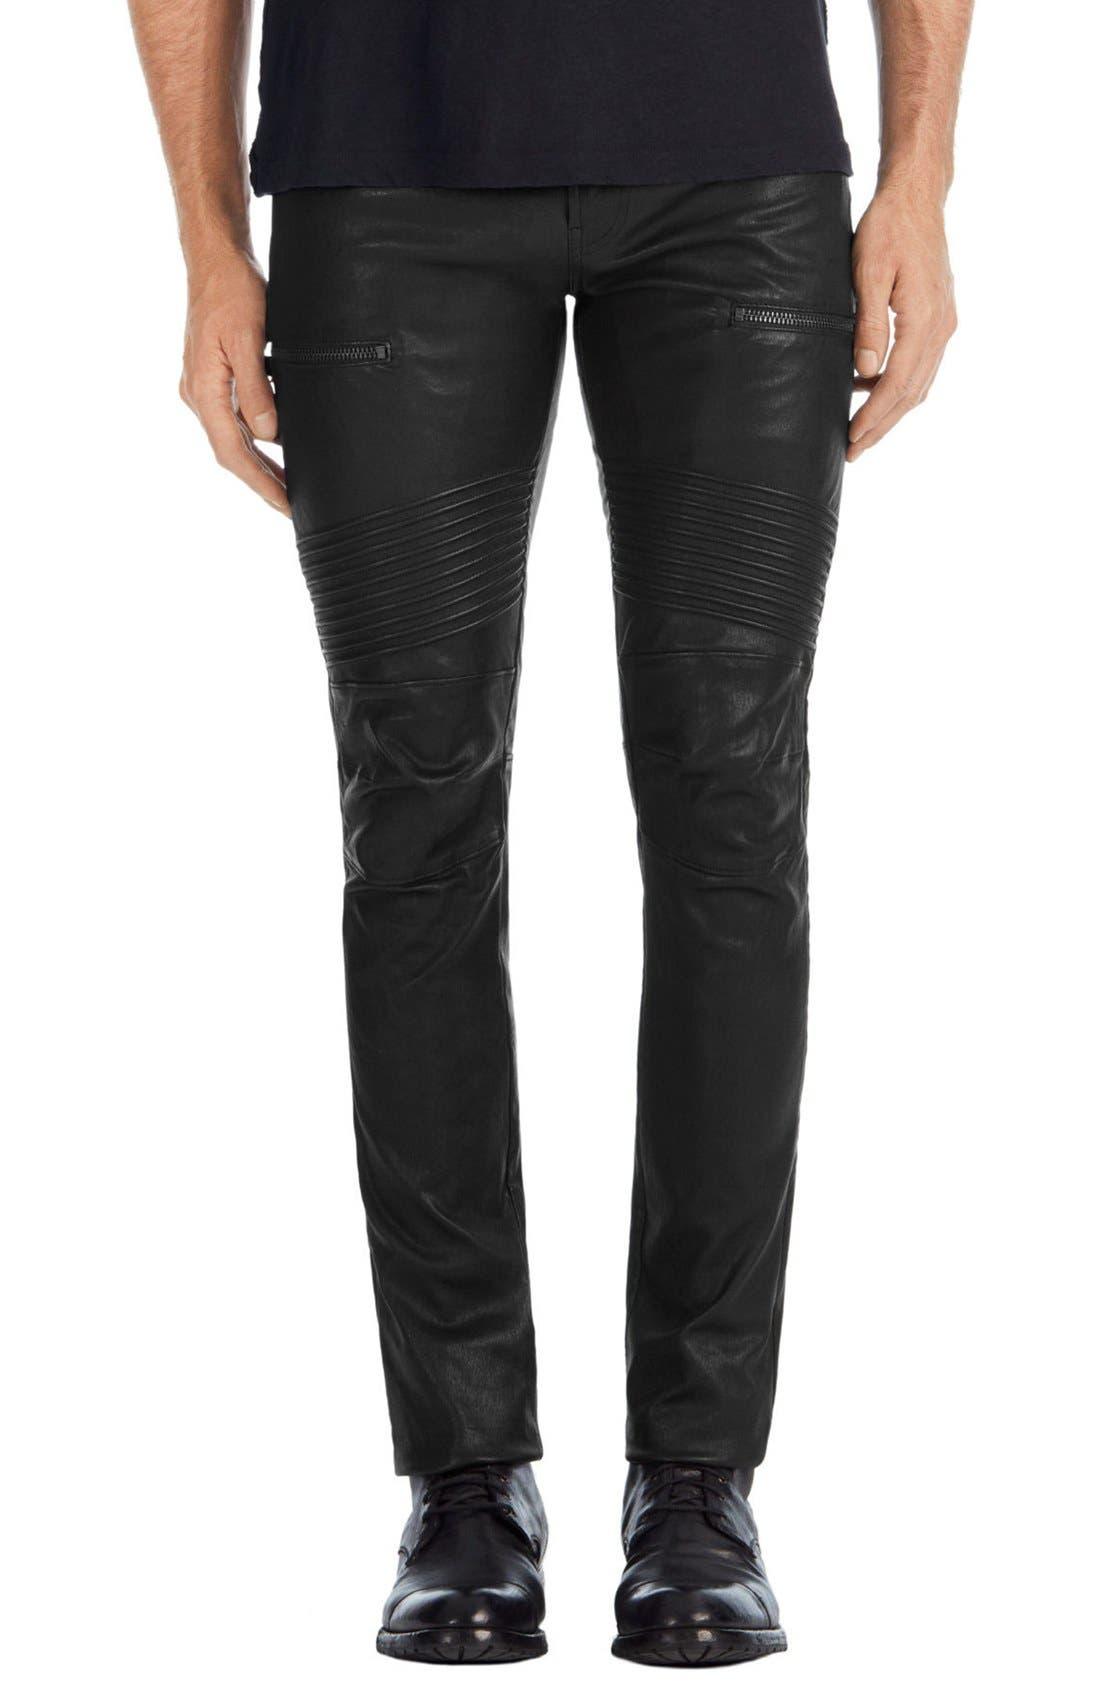 Acrux Skinny Fit Moto Leather Pants,                             Main thumbnail 1, color,                             Black